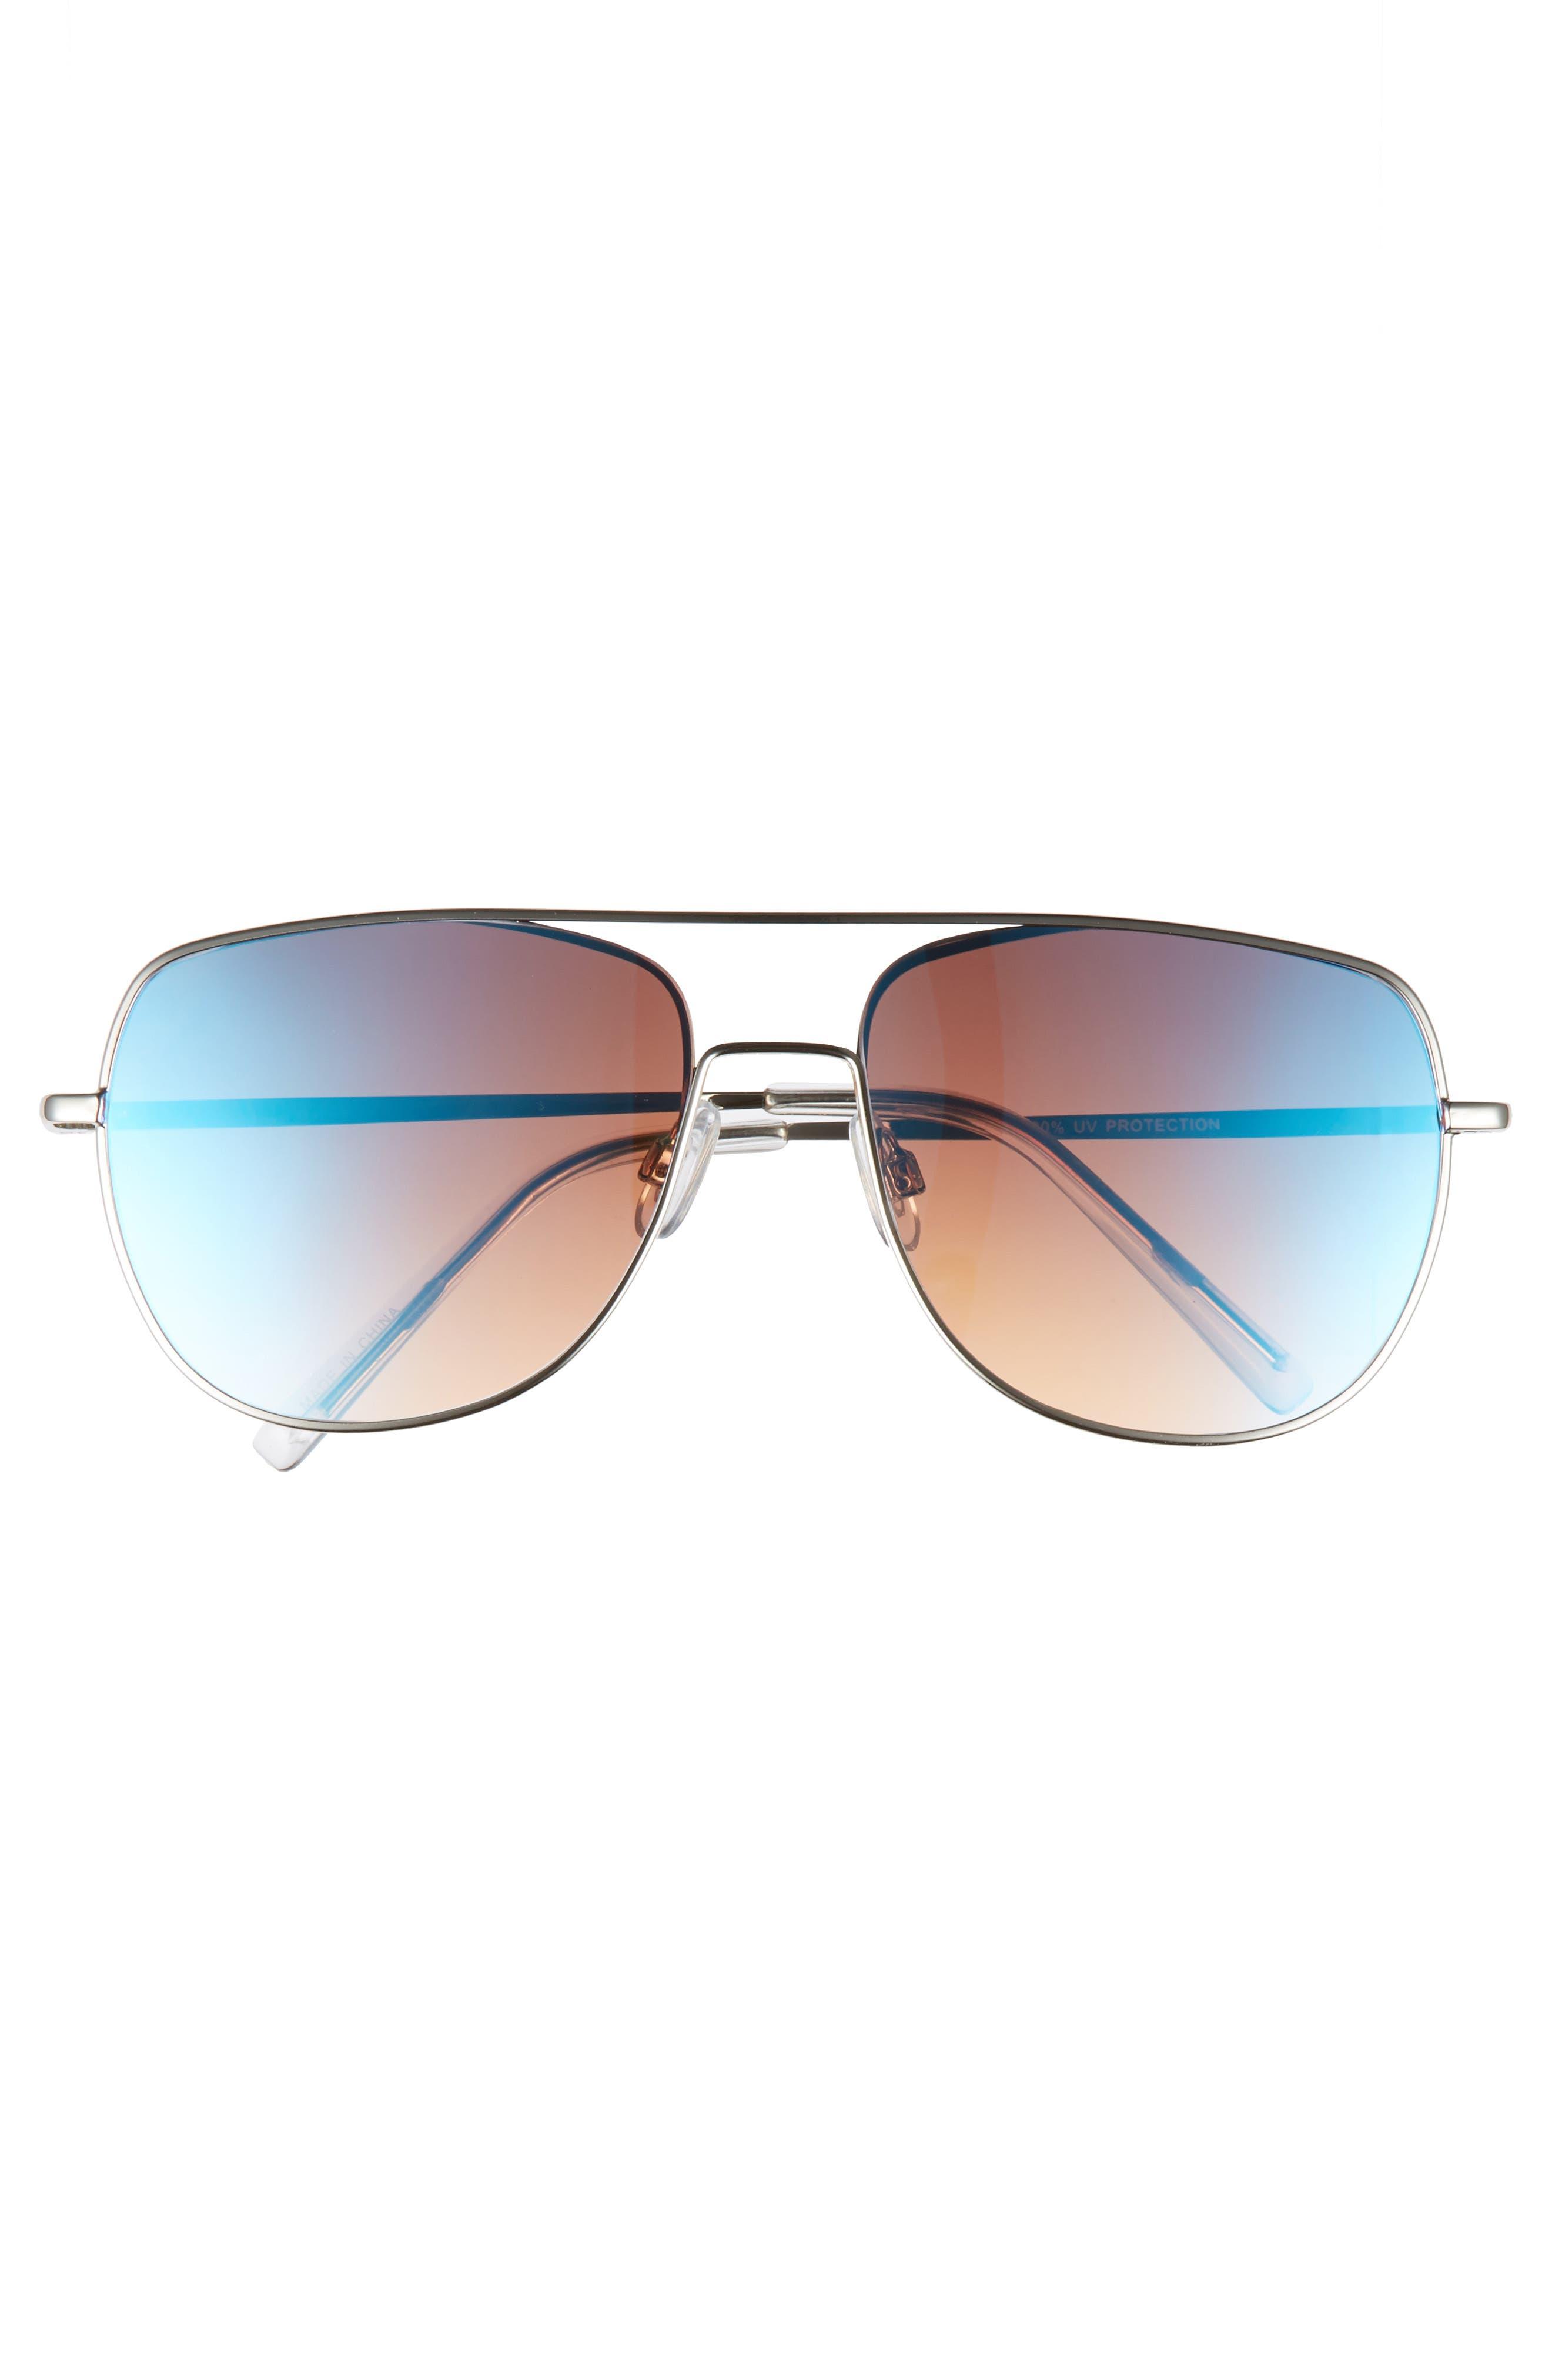 58mm Aviator Sunglasses,                             Alternate thumbnail 3, color,                             040